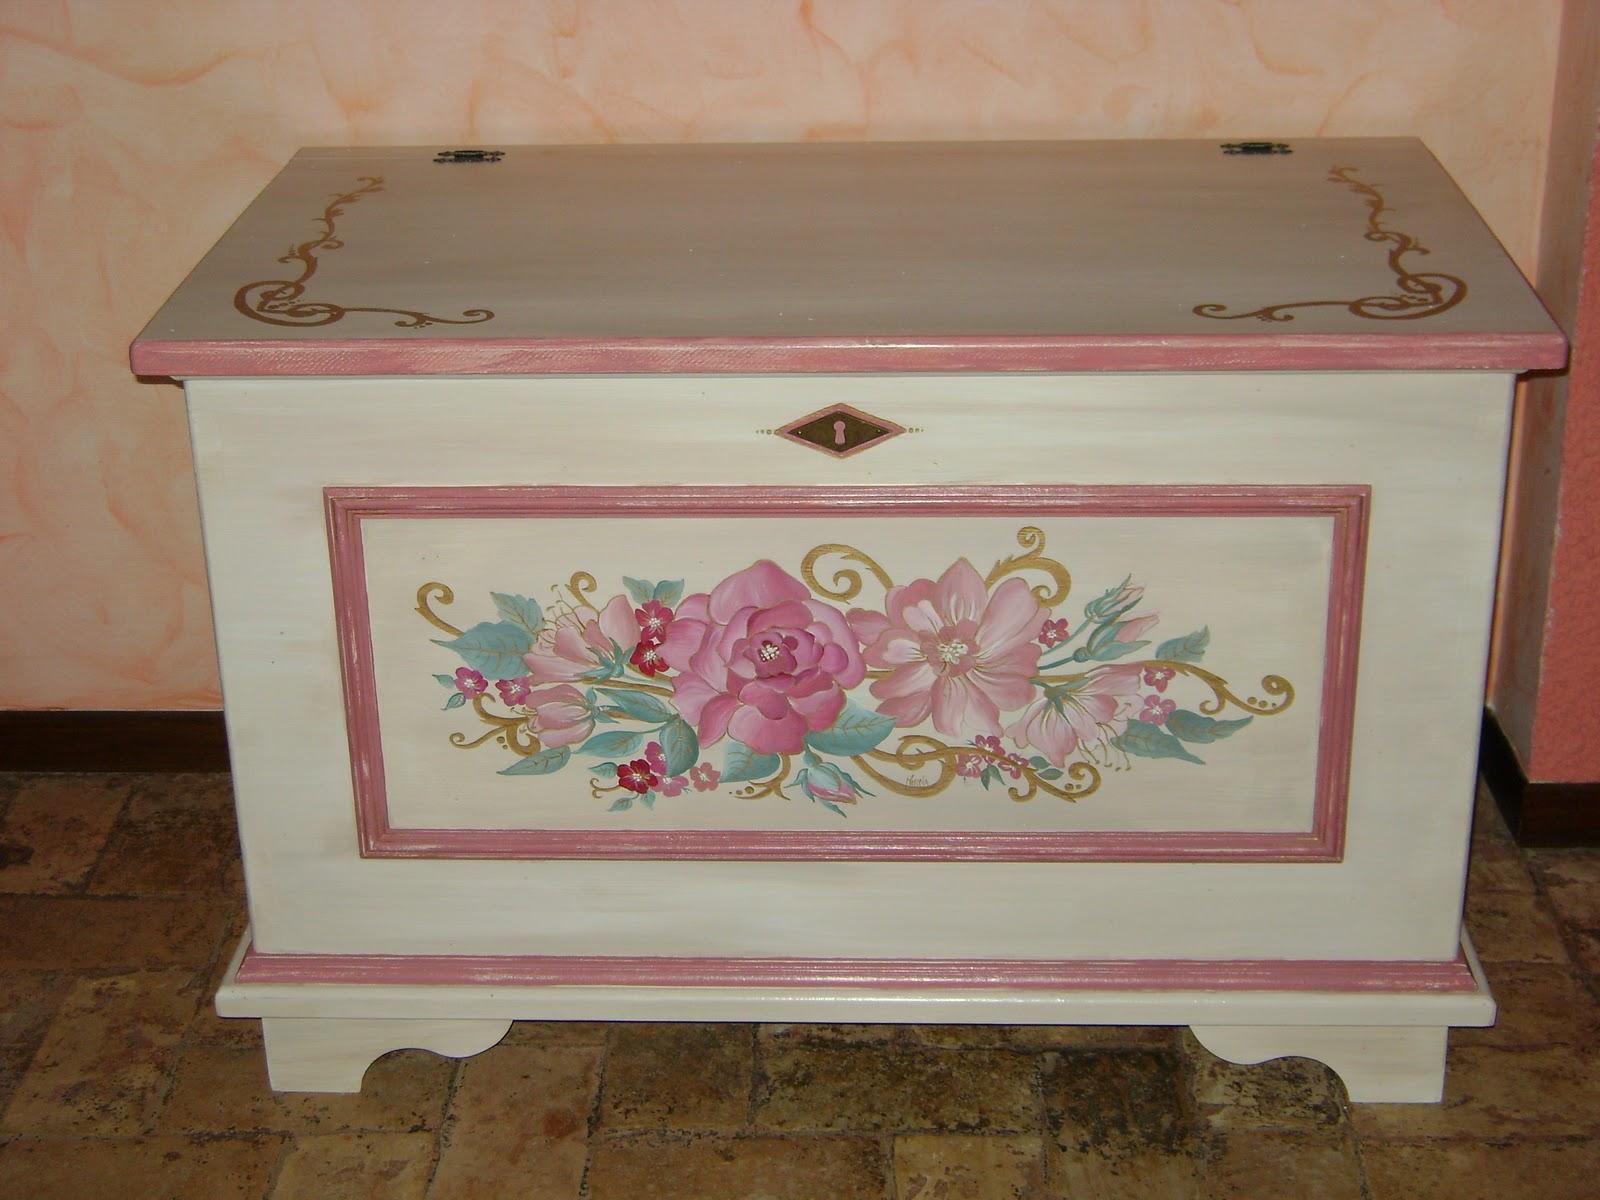 Mirnacreation artistic lab mobili dipinti for Disegni mobili casa